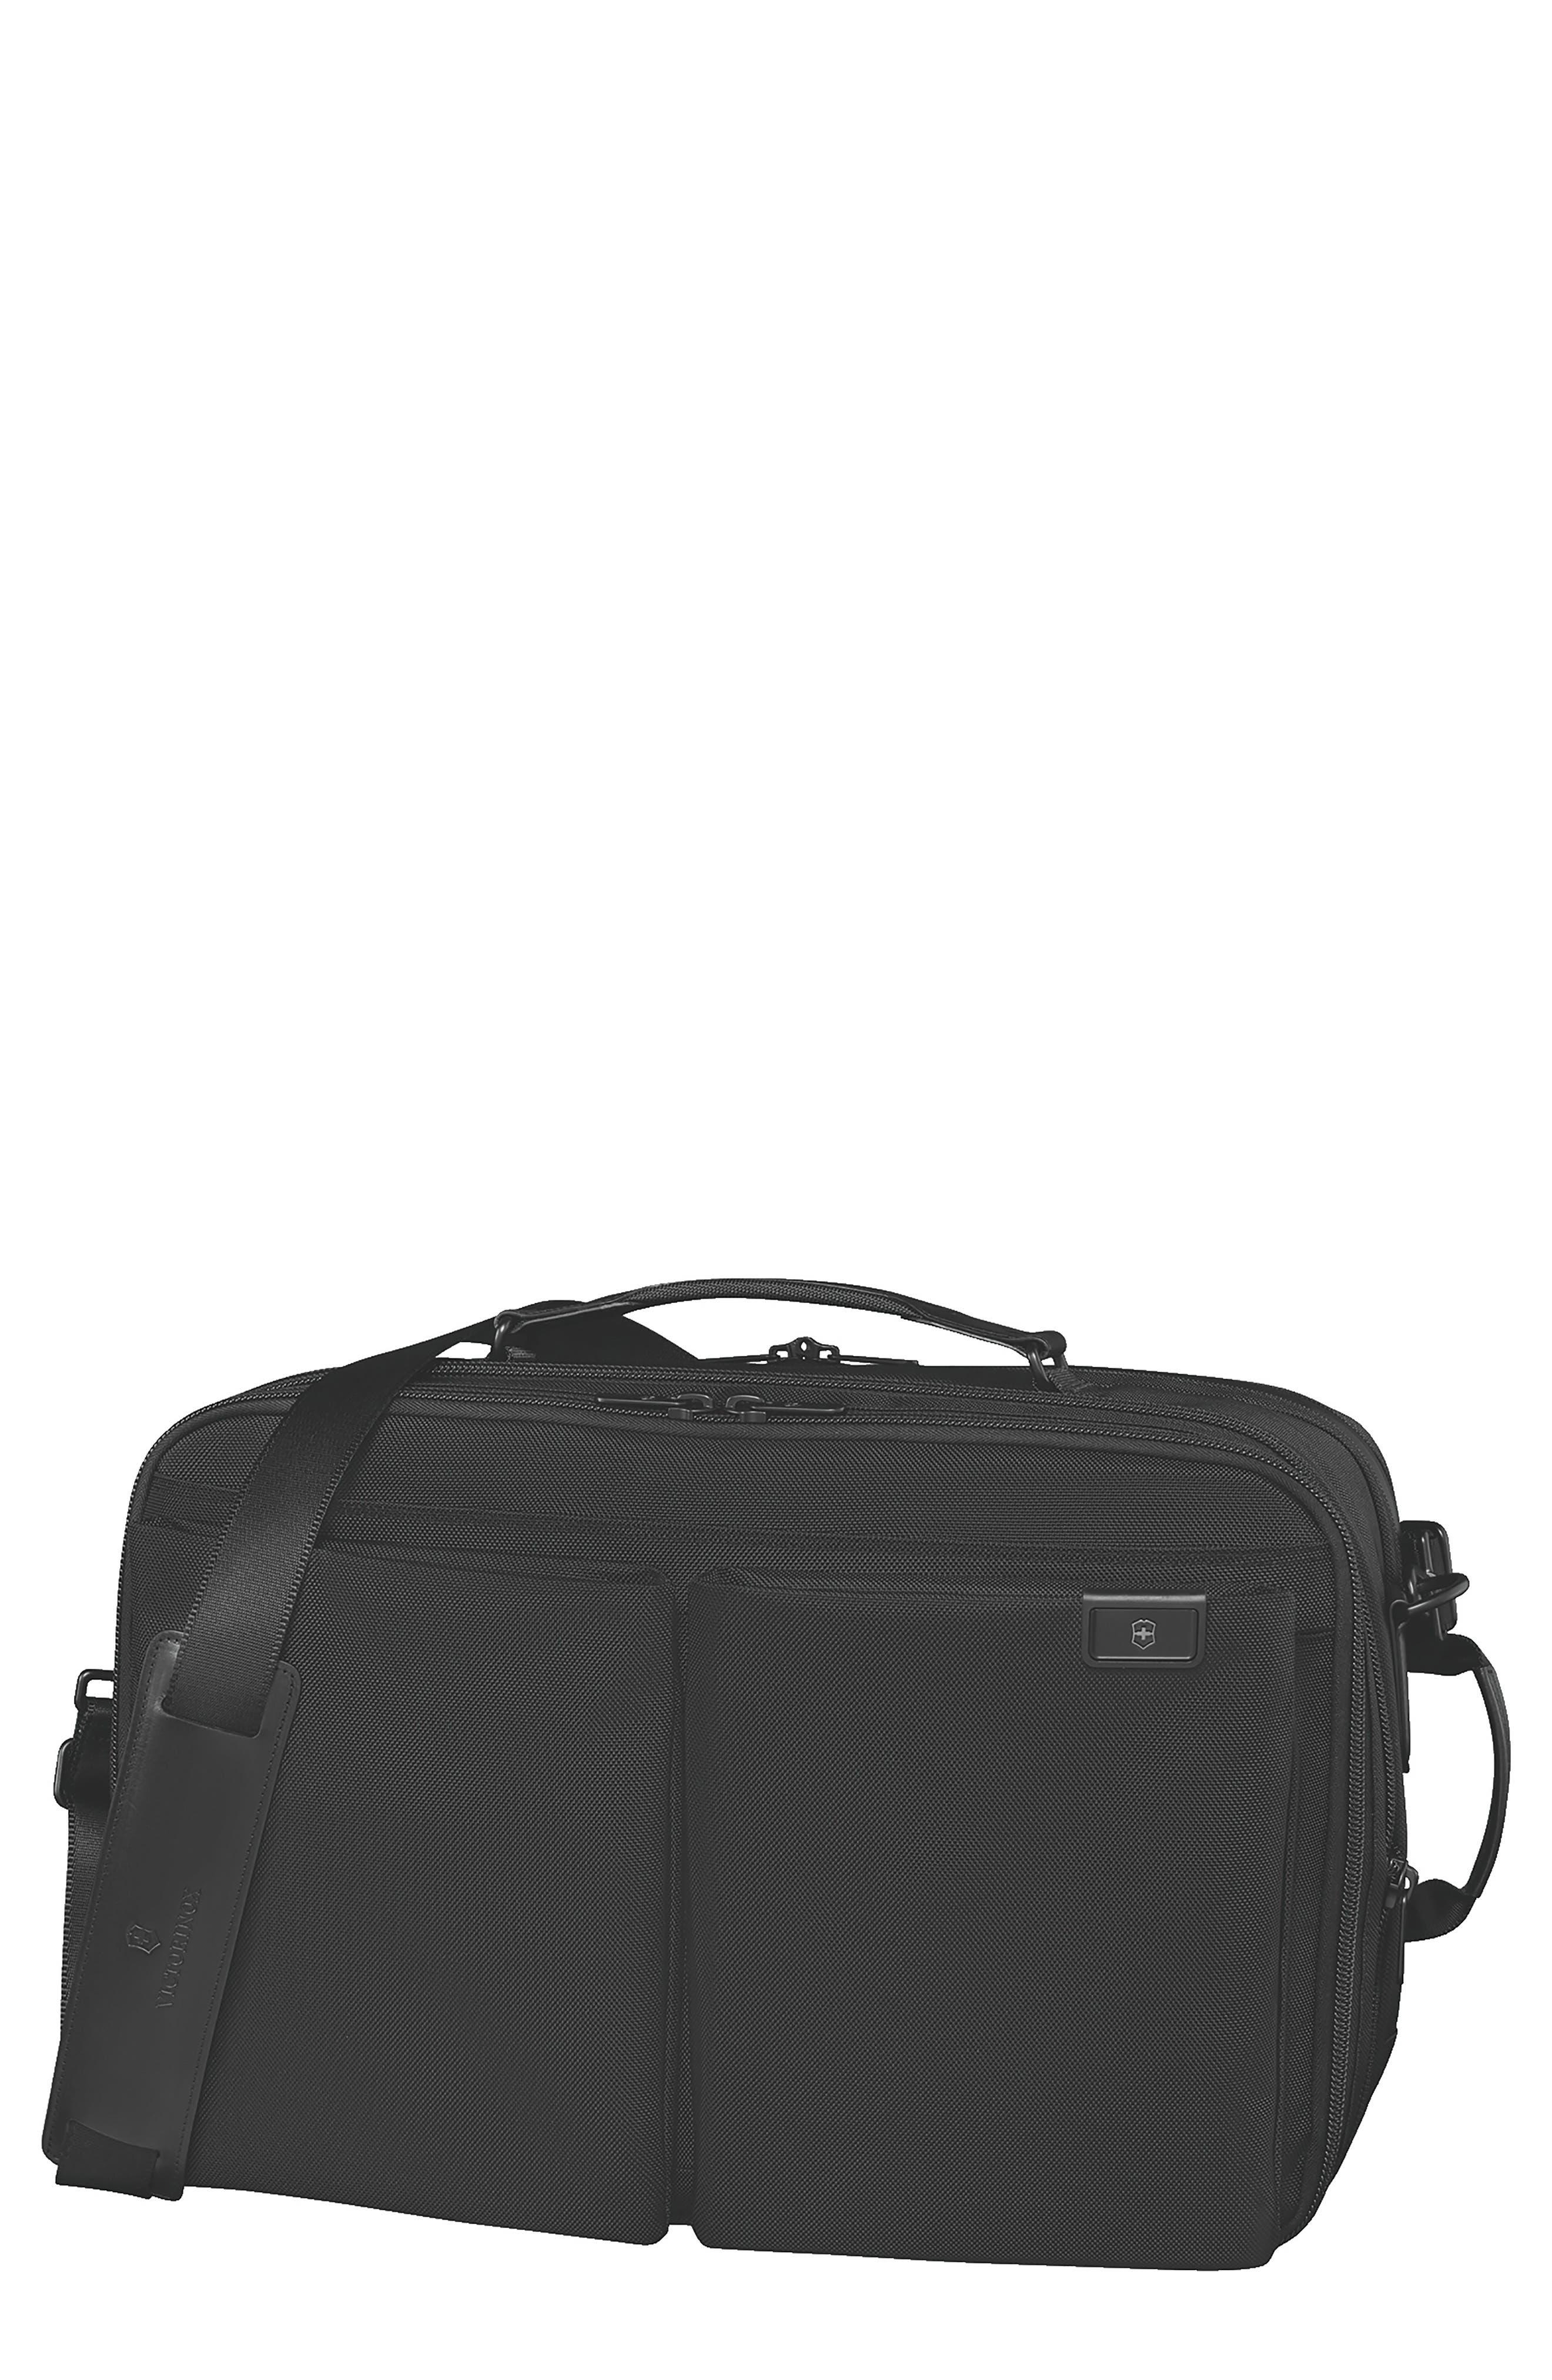 Lexicon 2.0 Convertible Backpack,                         Main,                         color, Black